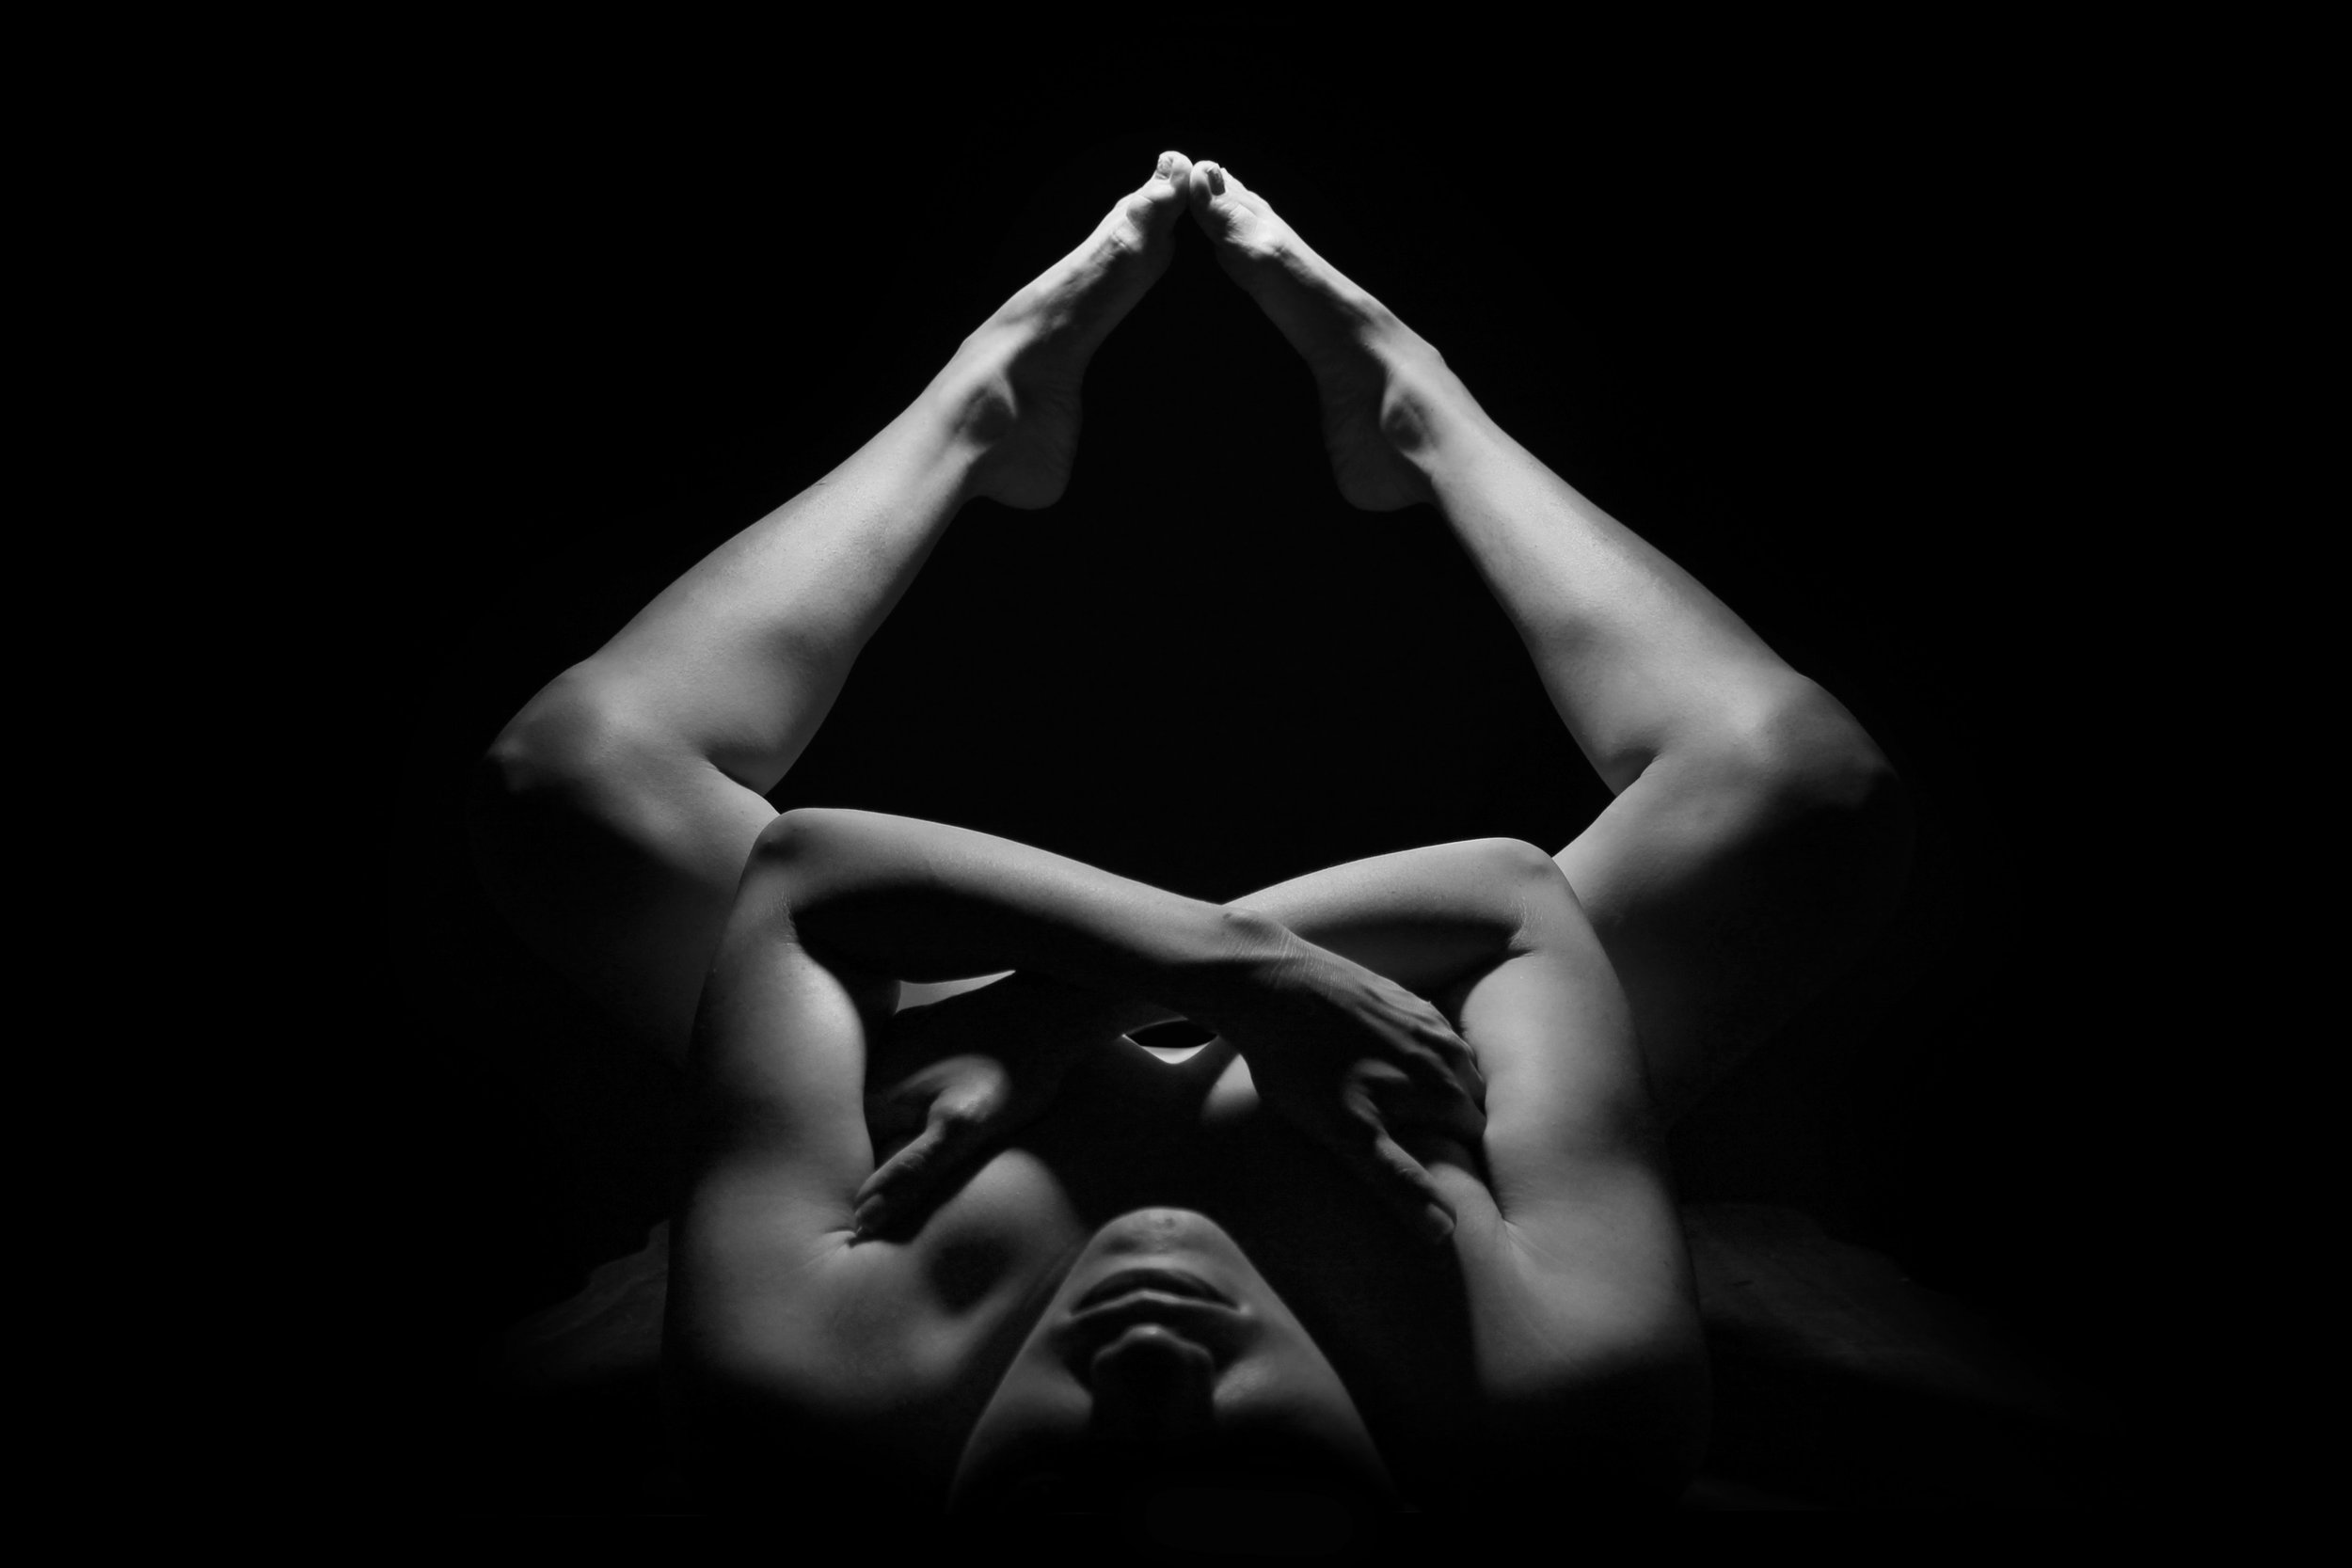 art-black-and-white-blur-226326.jpg